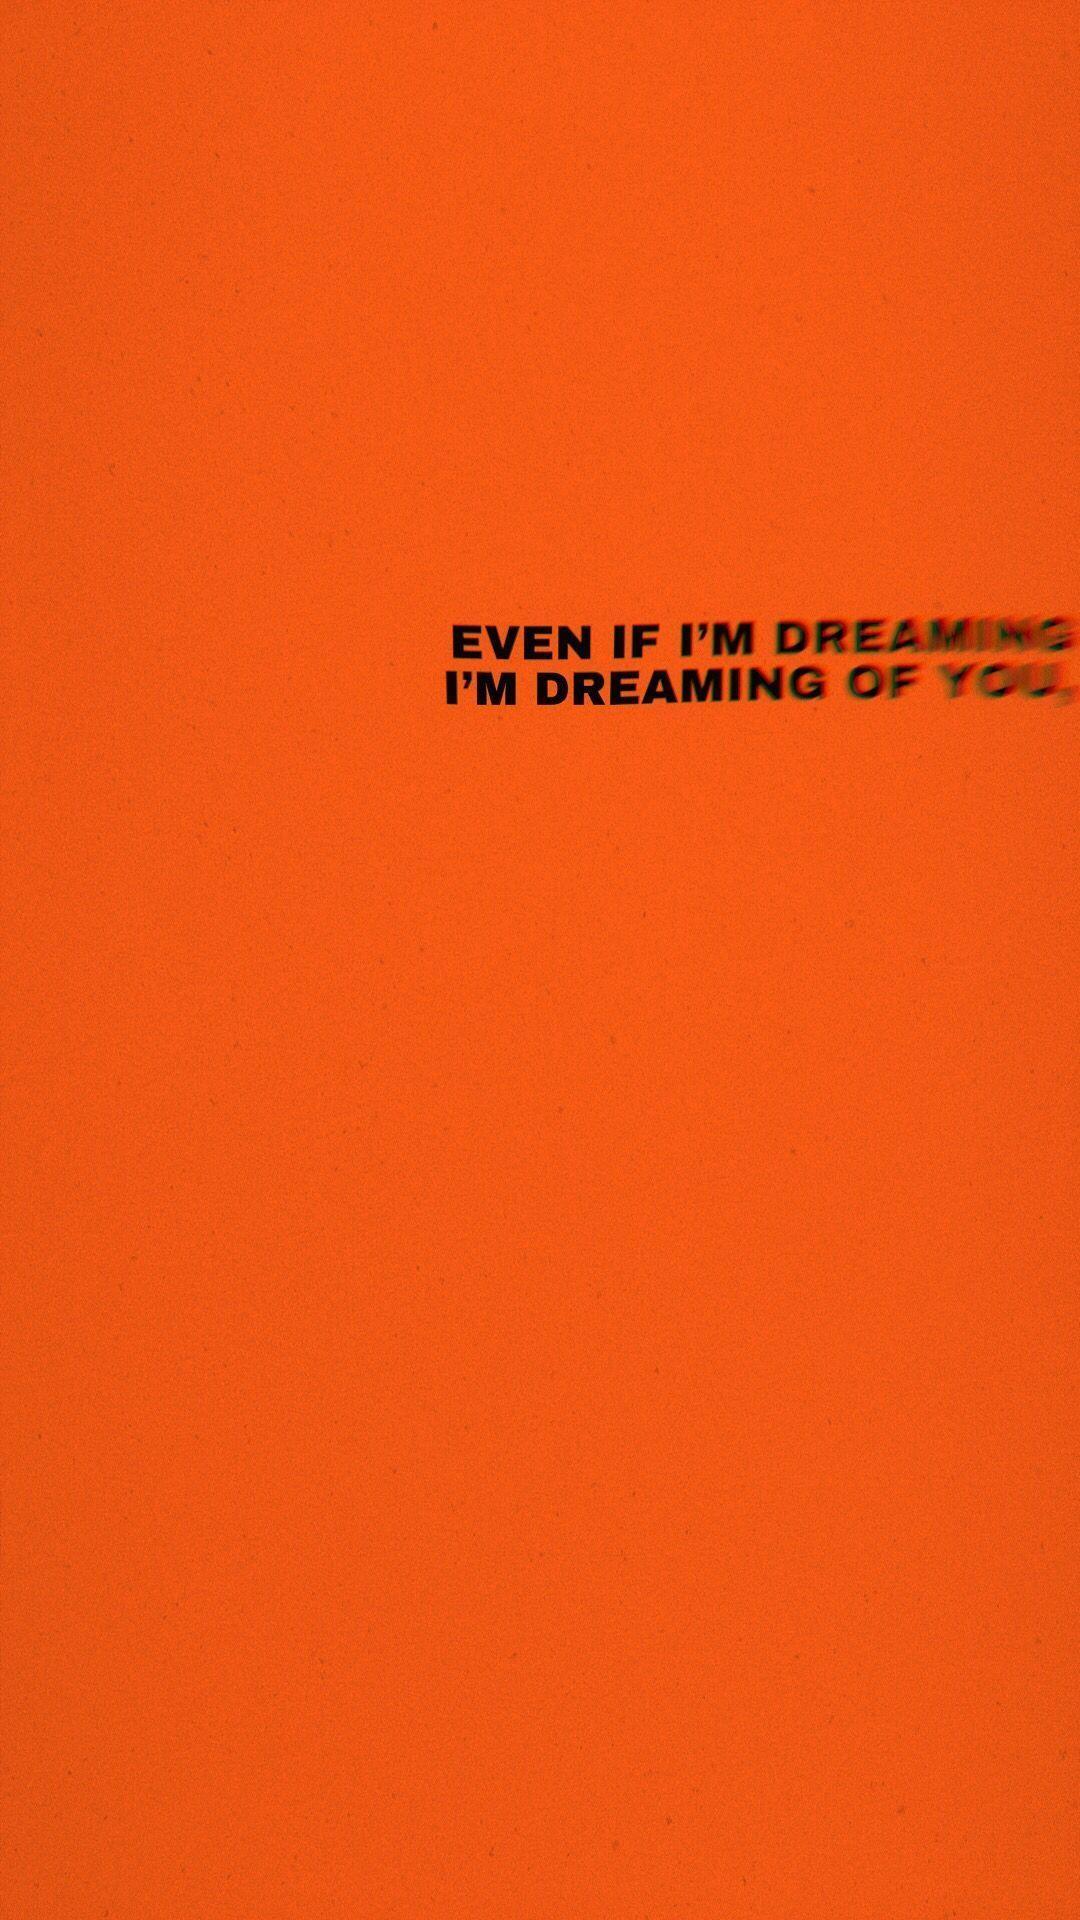 orange grunge aesthetic wallpapers